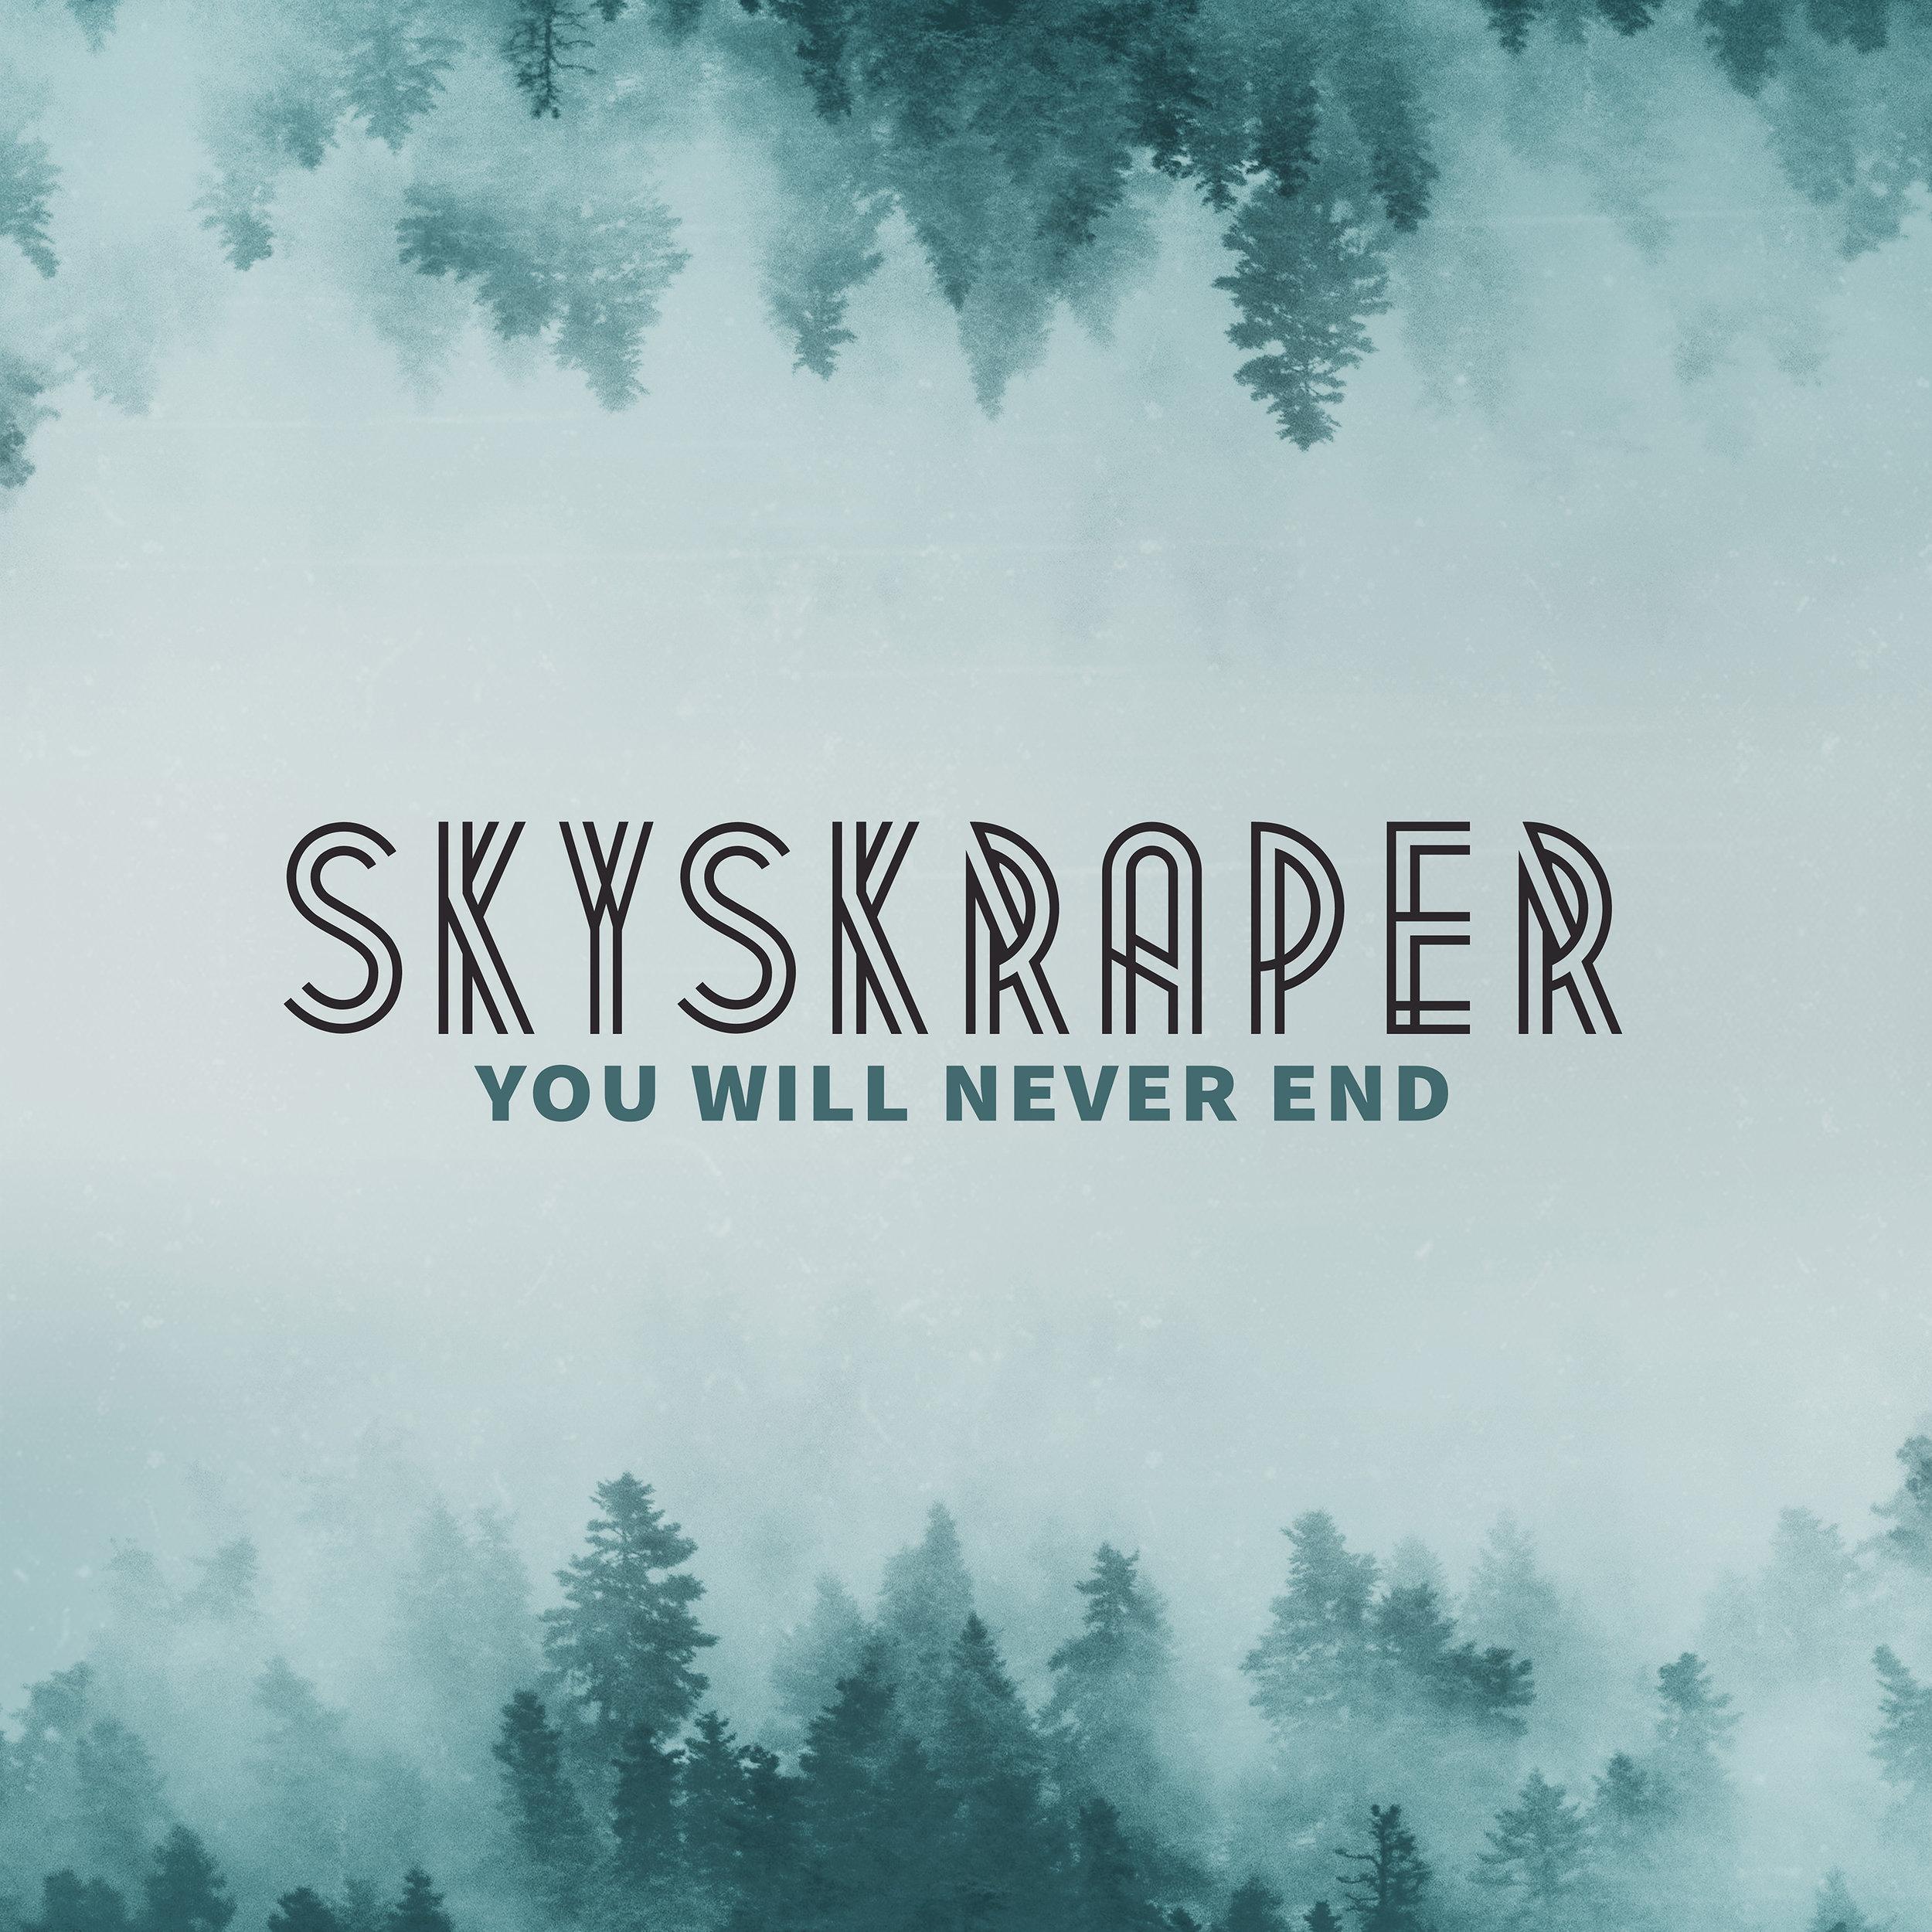 Skyskraper_You will never end_single iTunes 3000x3000.jpg